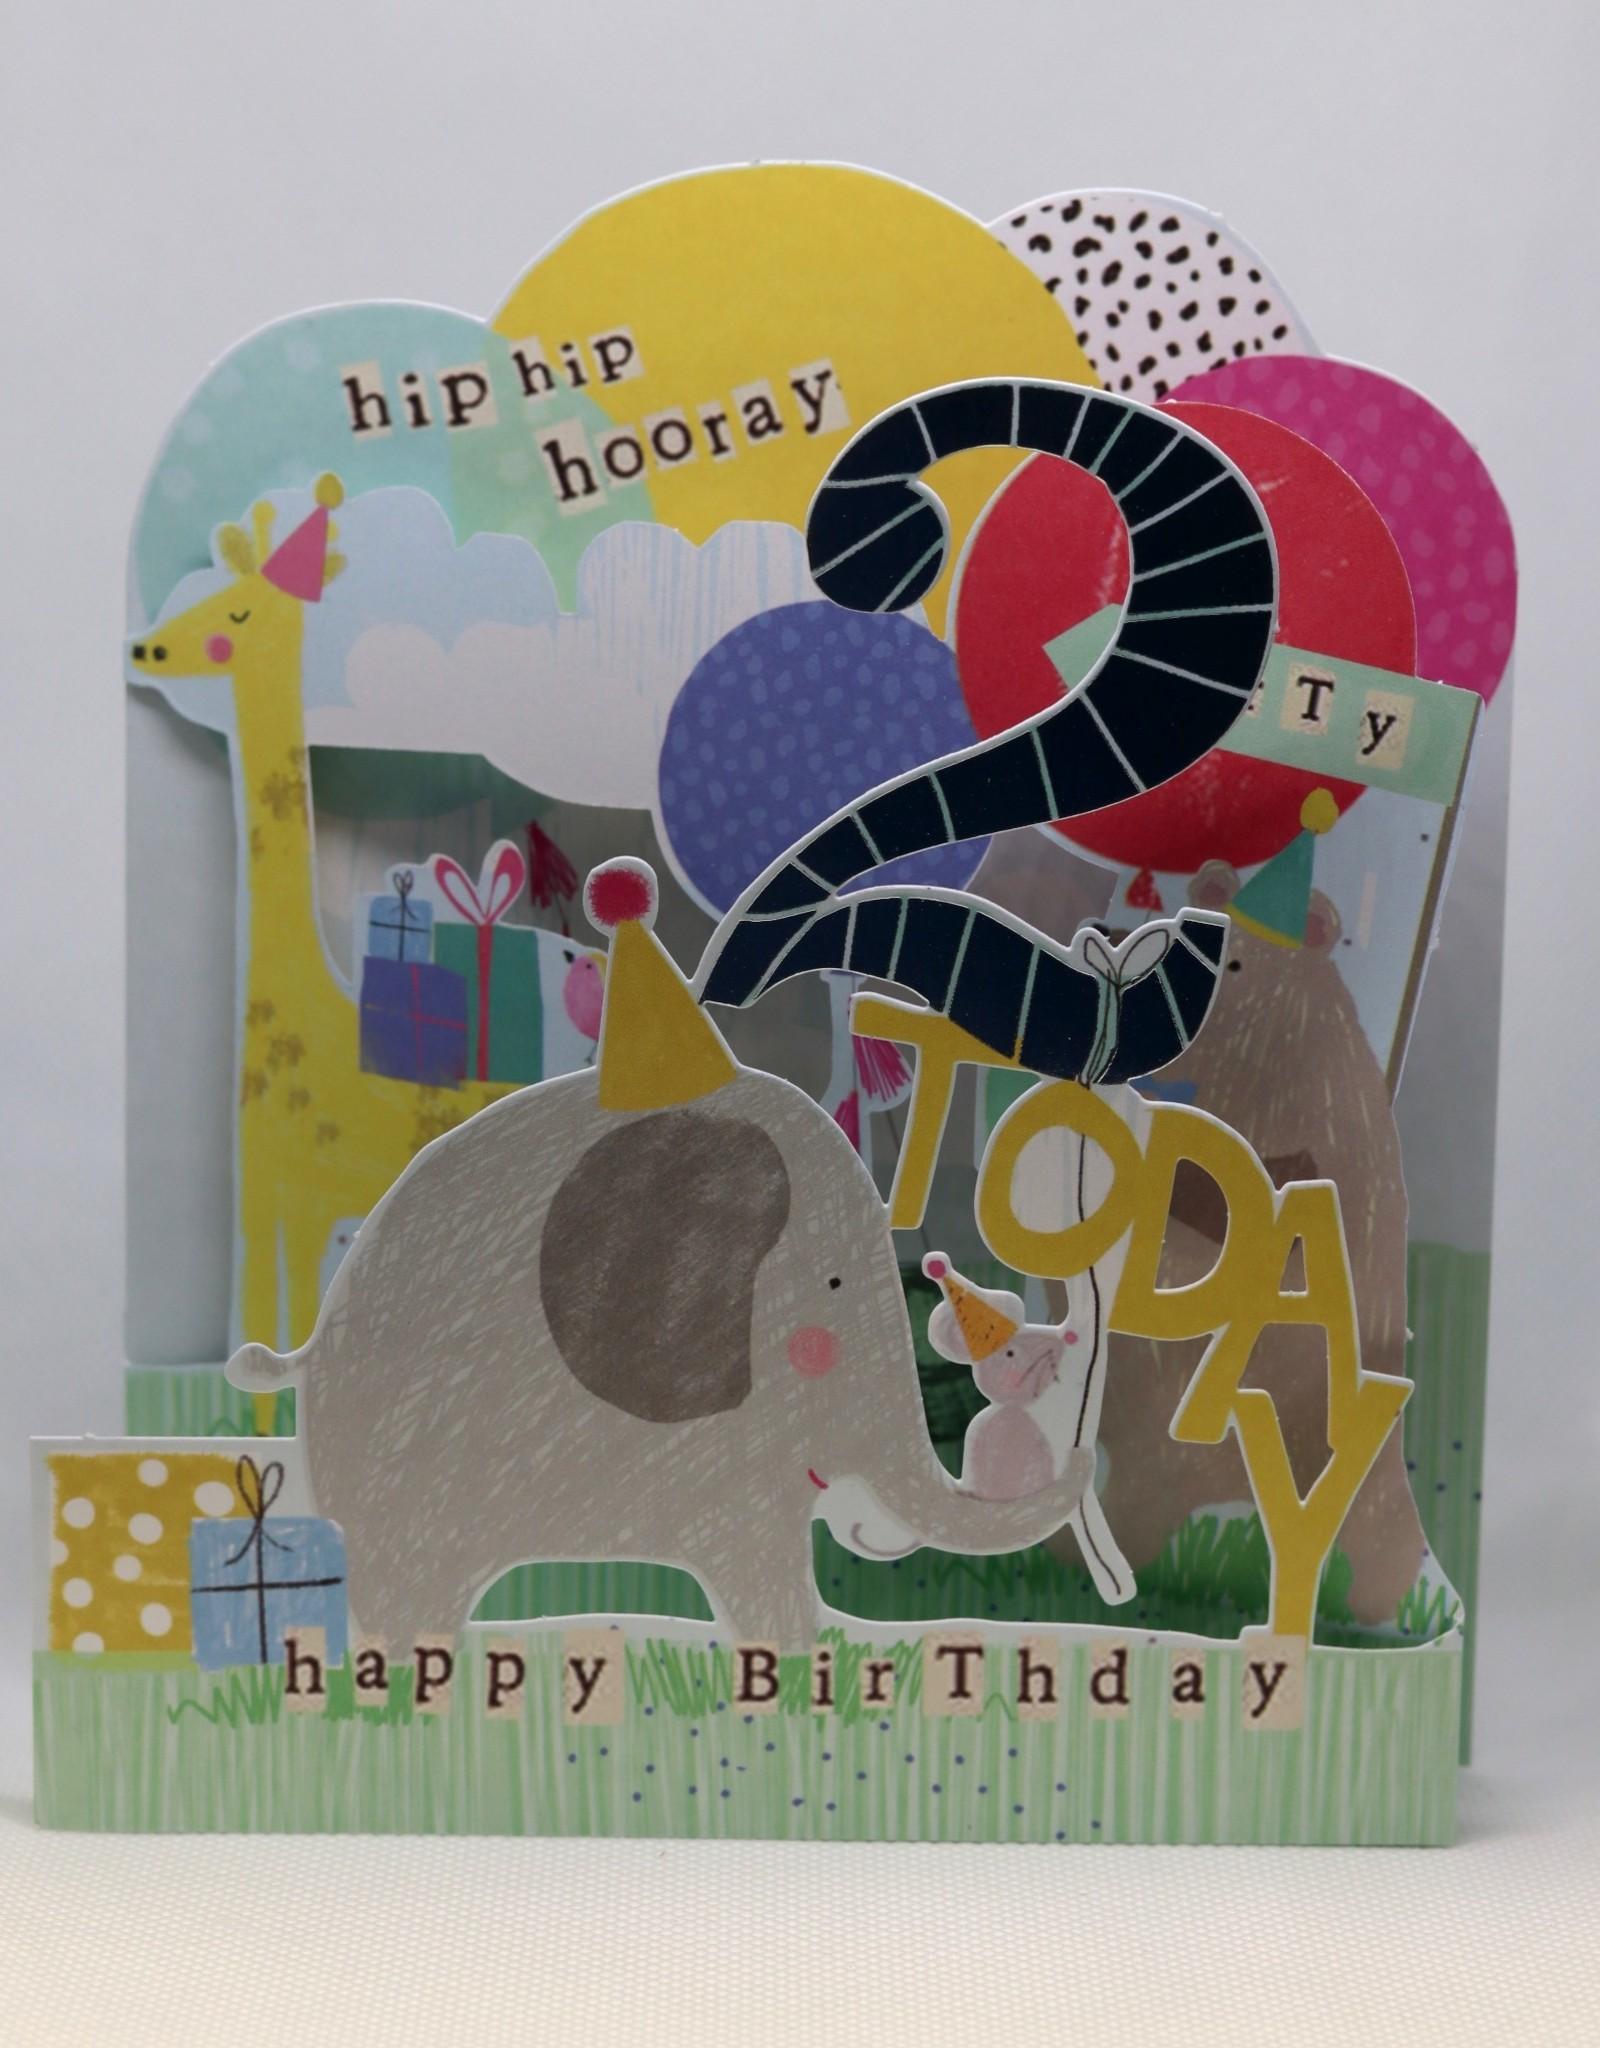 Paperlink Bday Card 02, Hip-hip Hooray